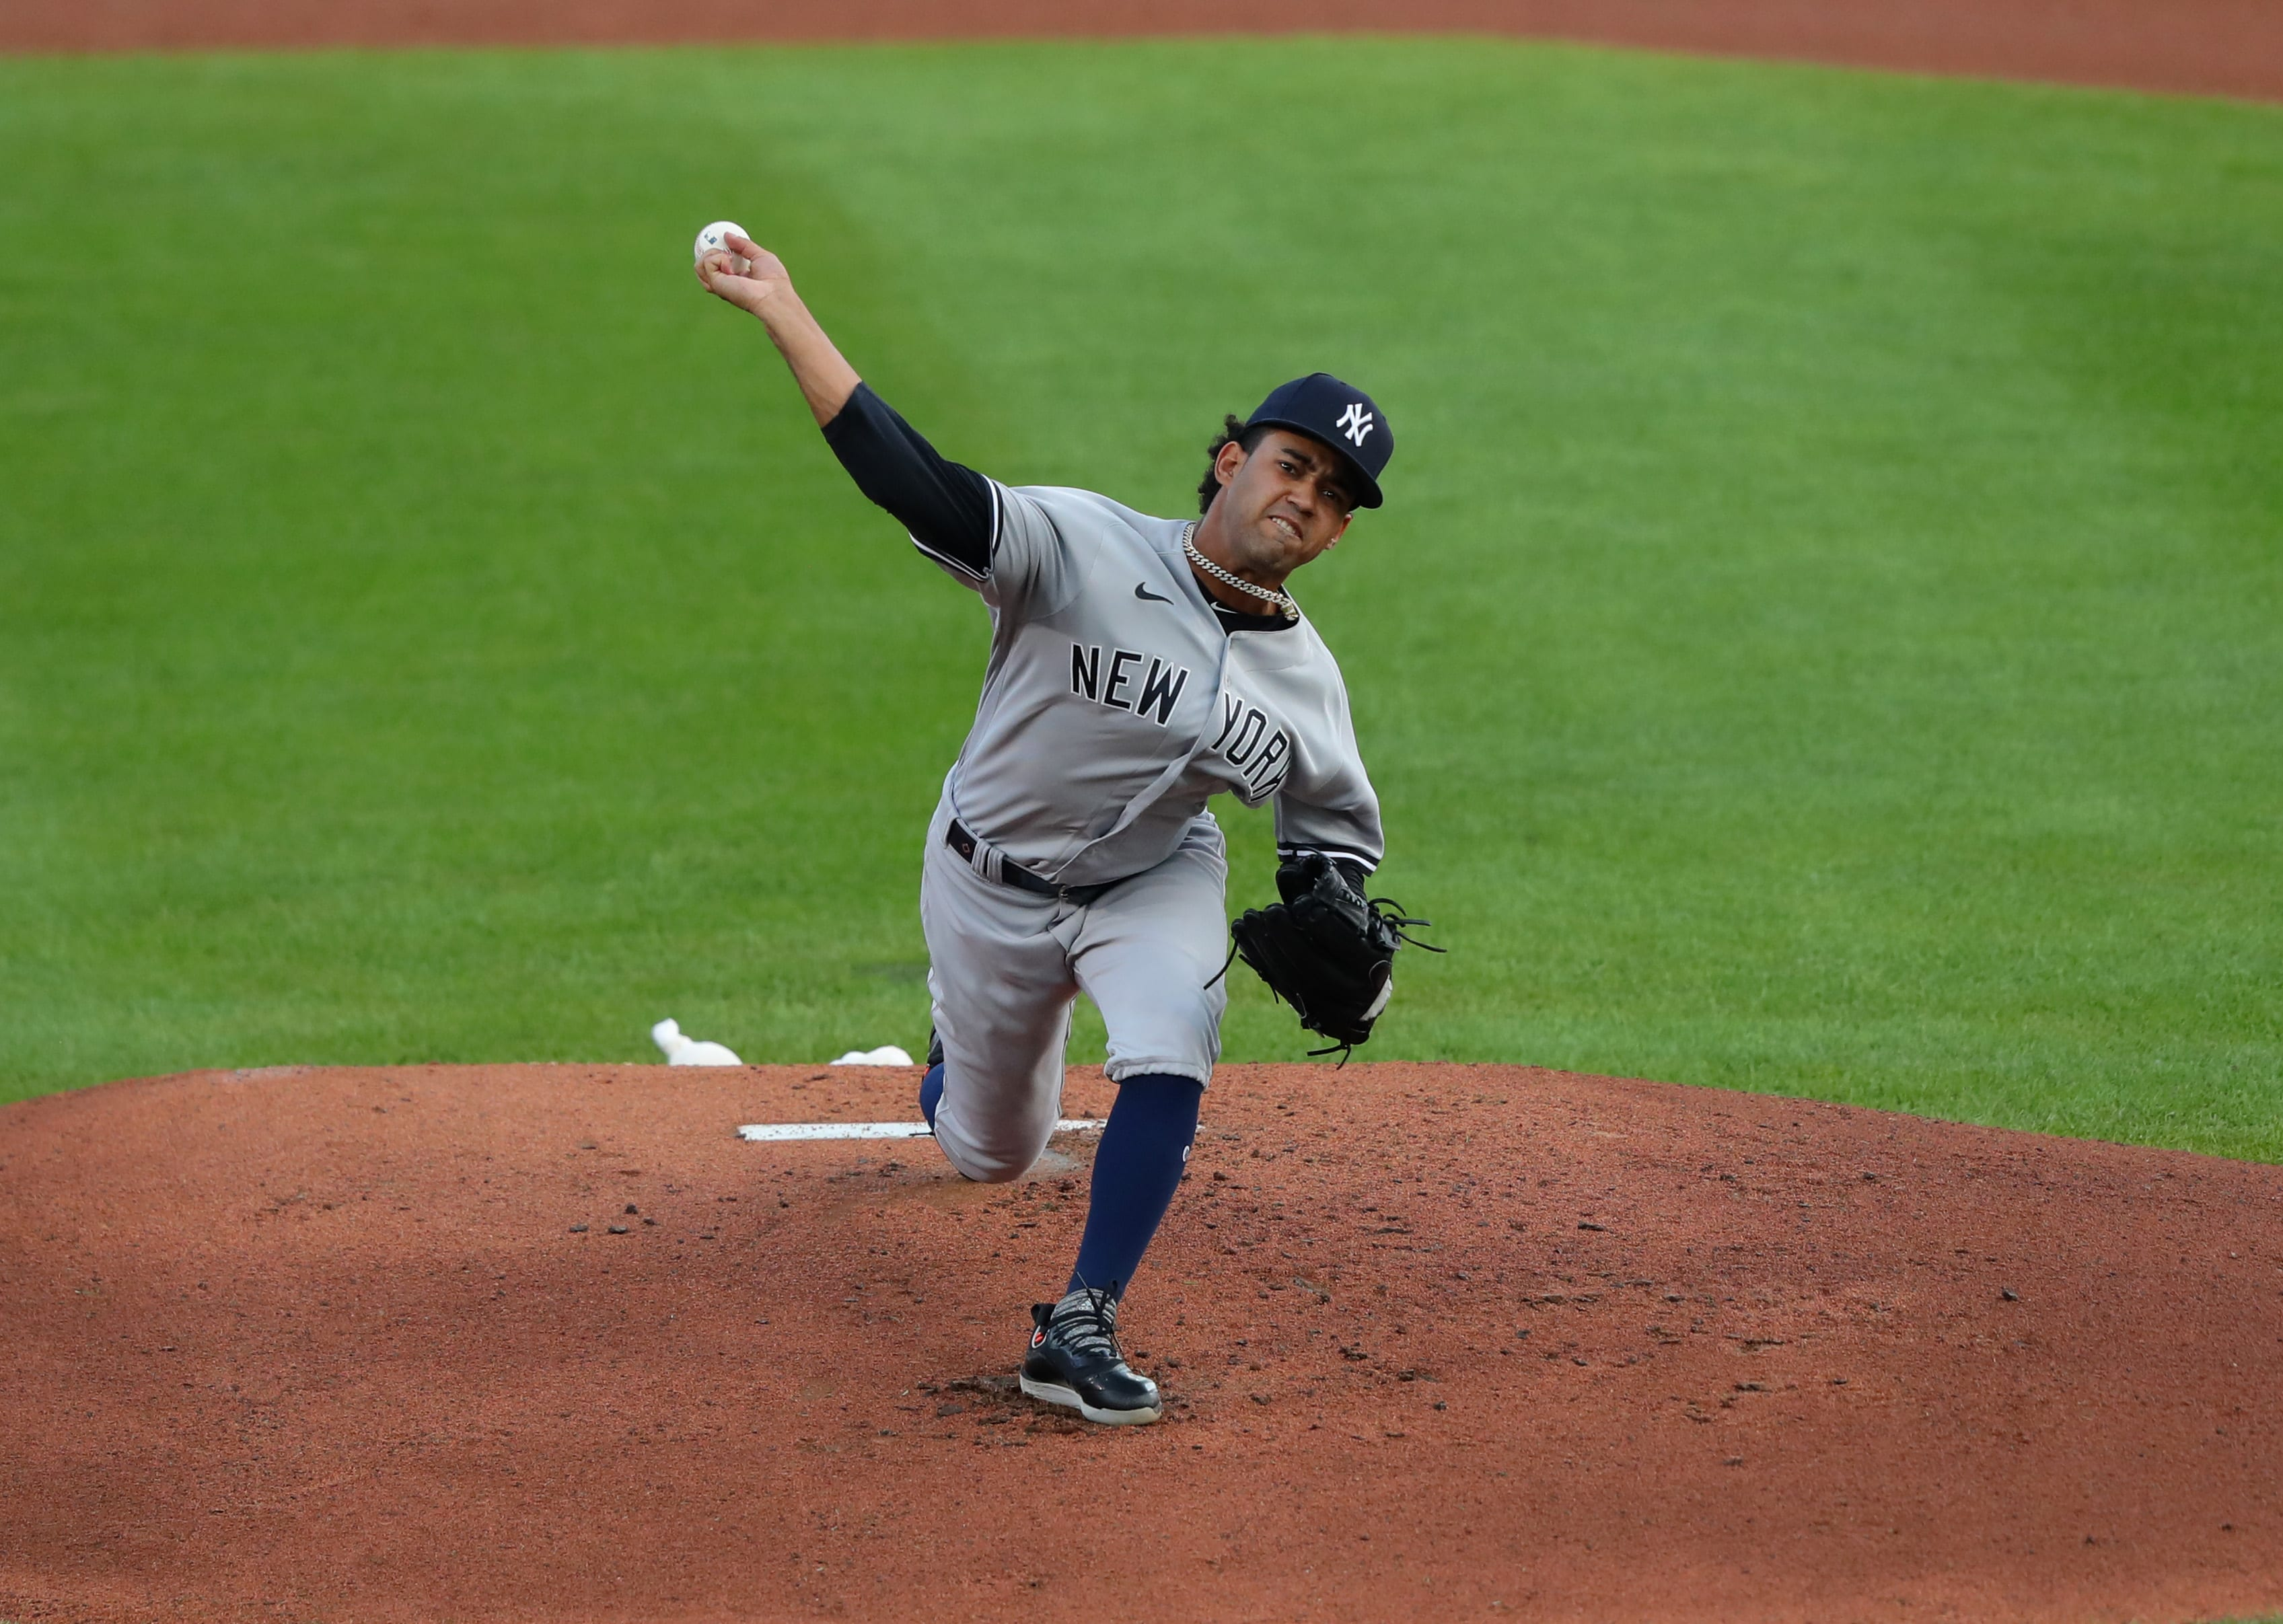 New York Yankees, Deivi Garcia